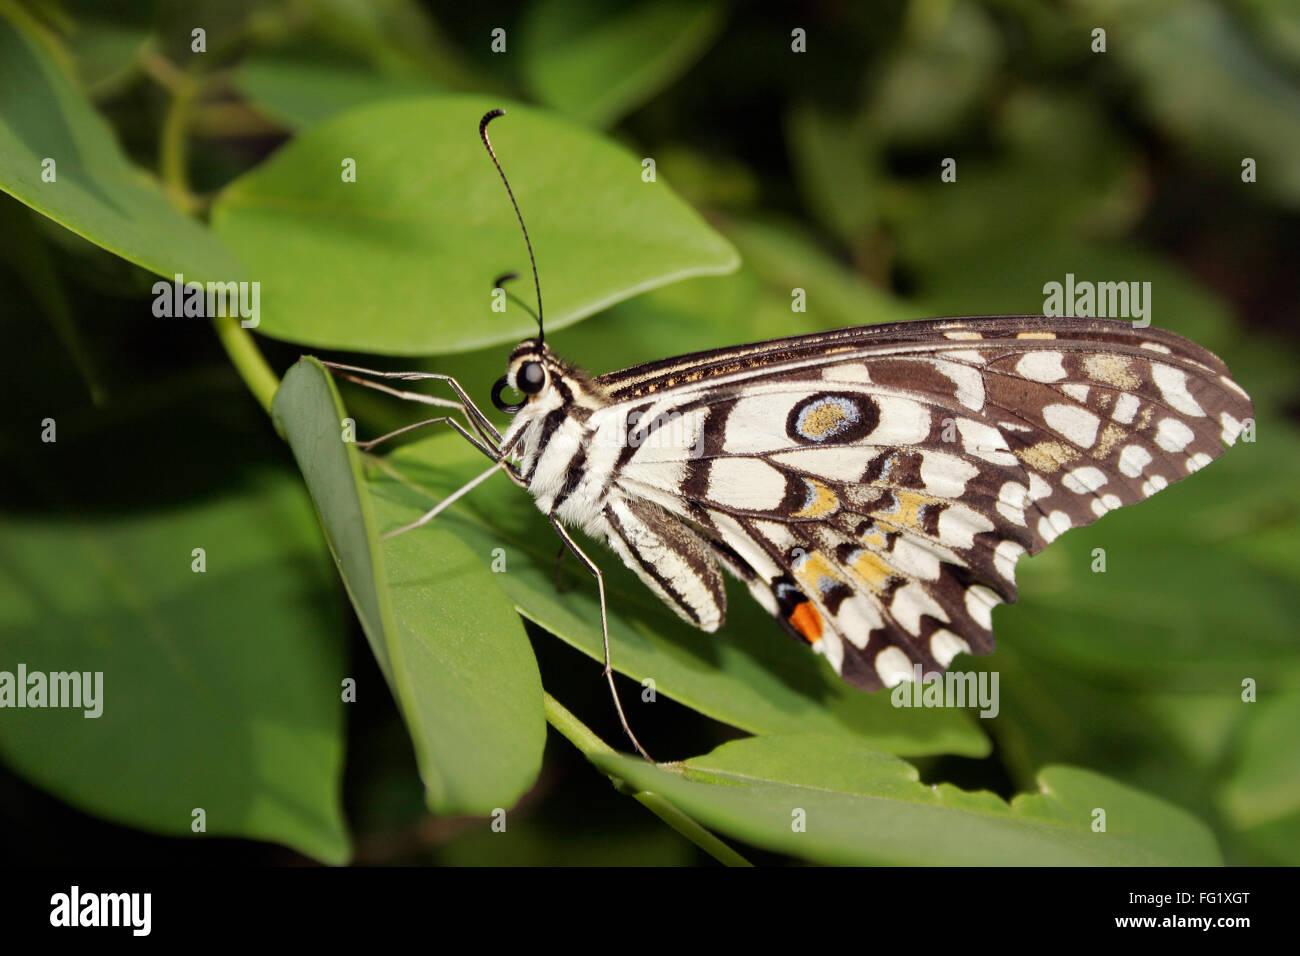 Insekten, Schmetterling Lime Butterfly Ii Princeps Demoleus Libanius Ii fruhstorferij Stockbild